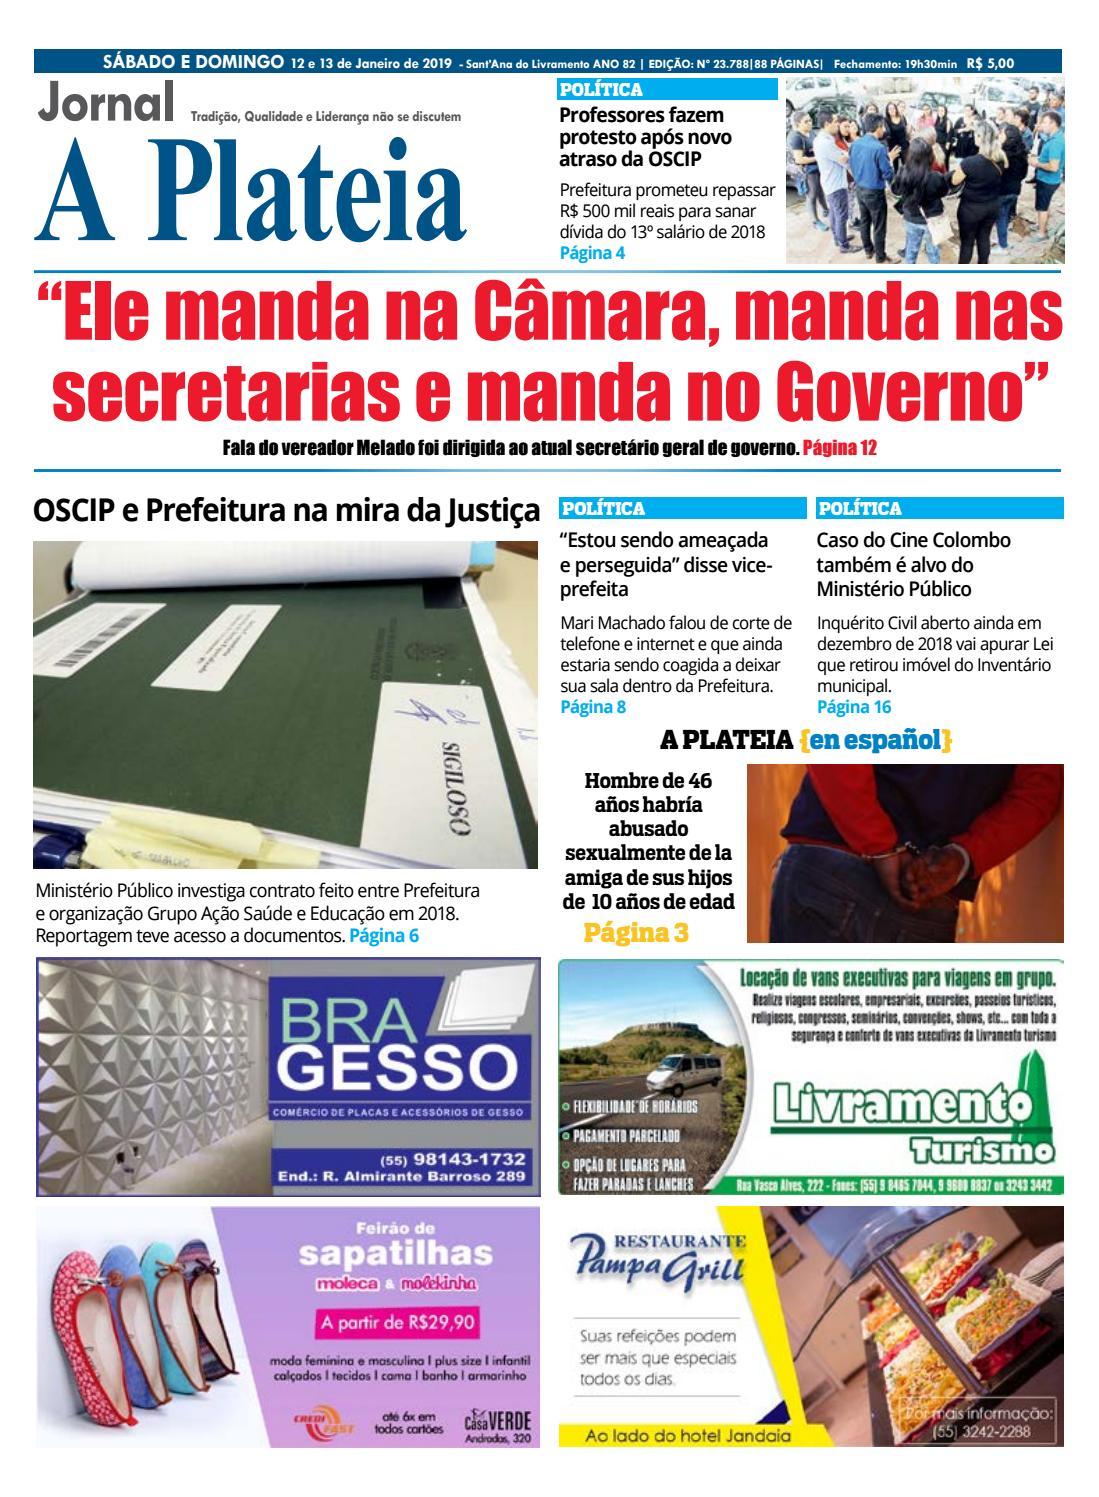 Jornal A Plateia - 12 de Janeiro 2019 by Jornal A Plateia Livramento - issuu a2d4c8112e6b0